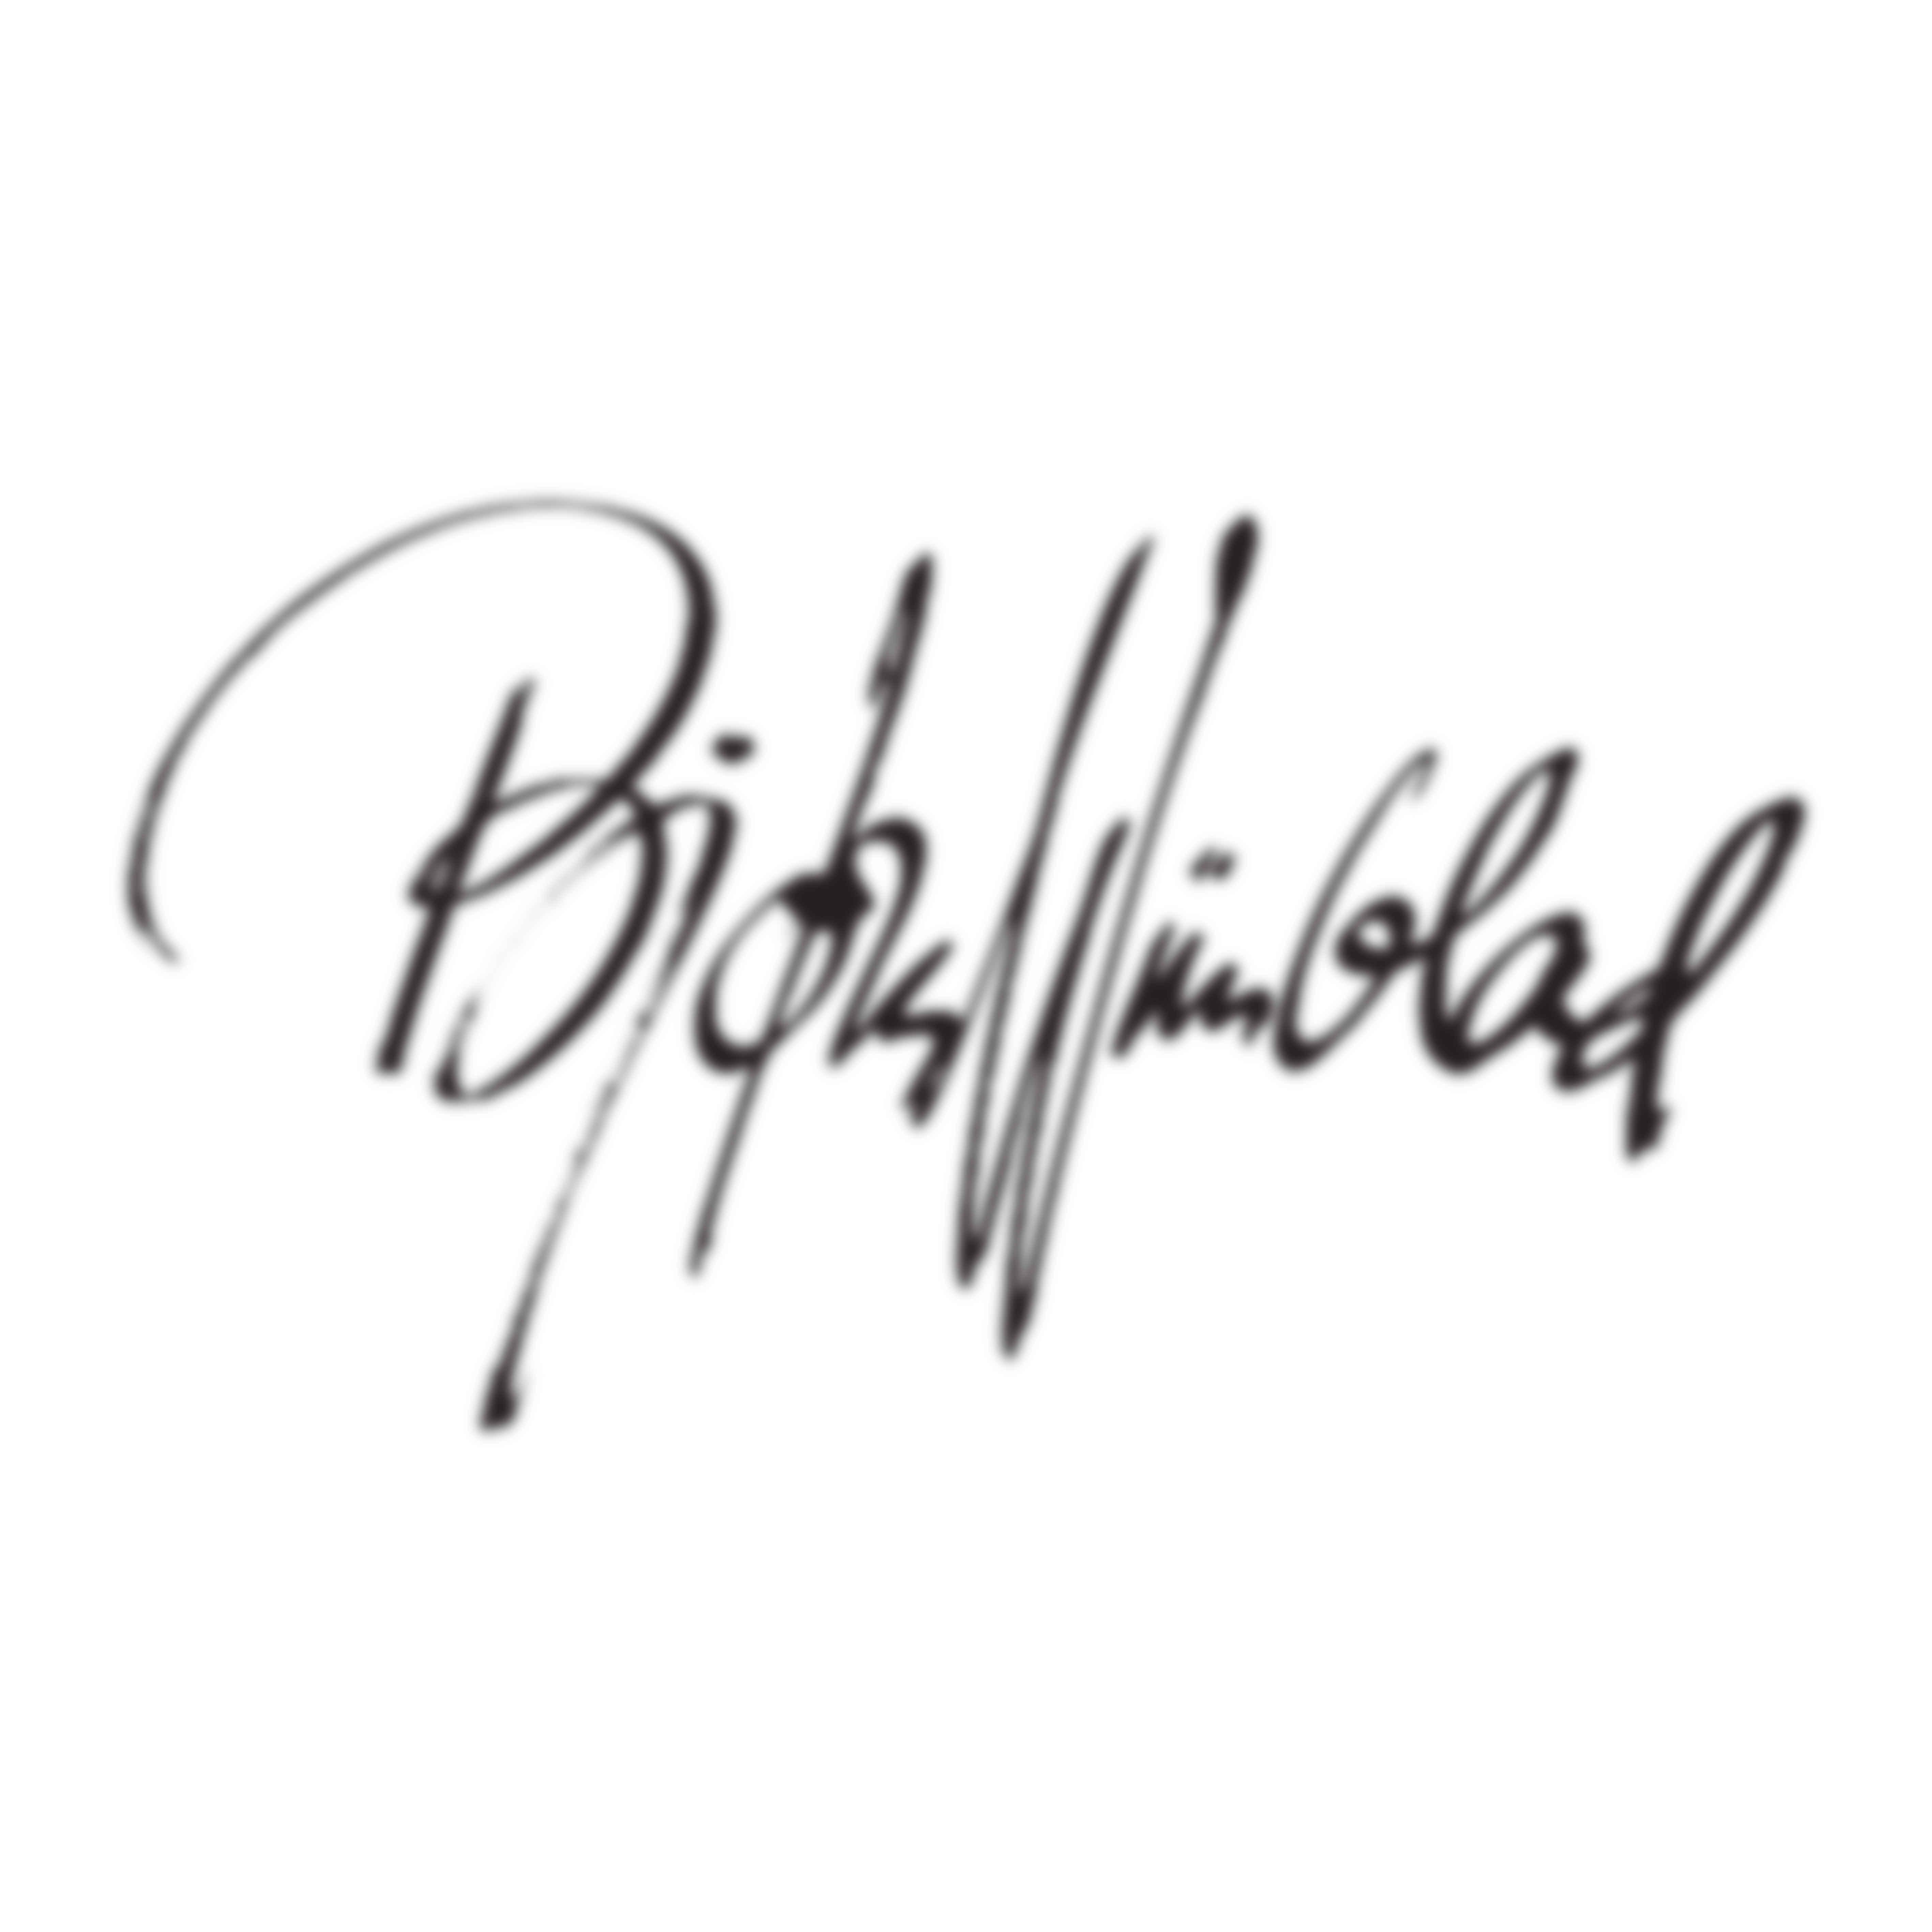 Bjorn Wiinblad logo